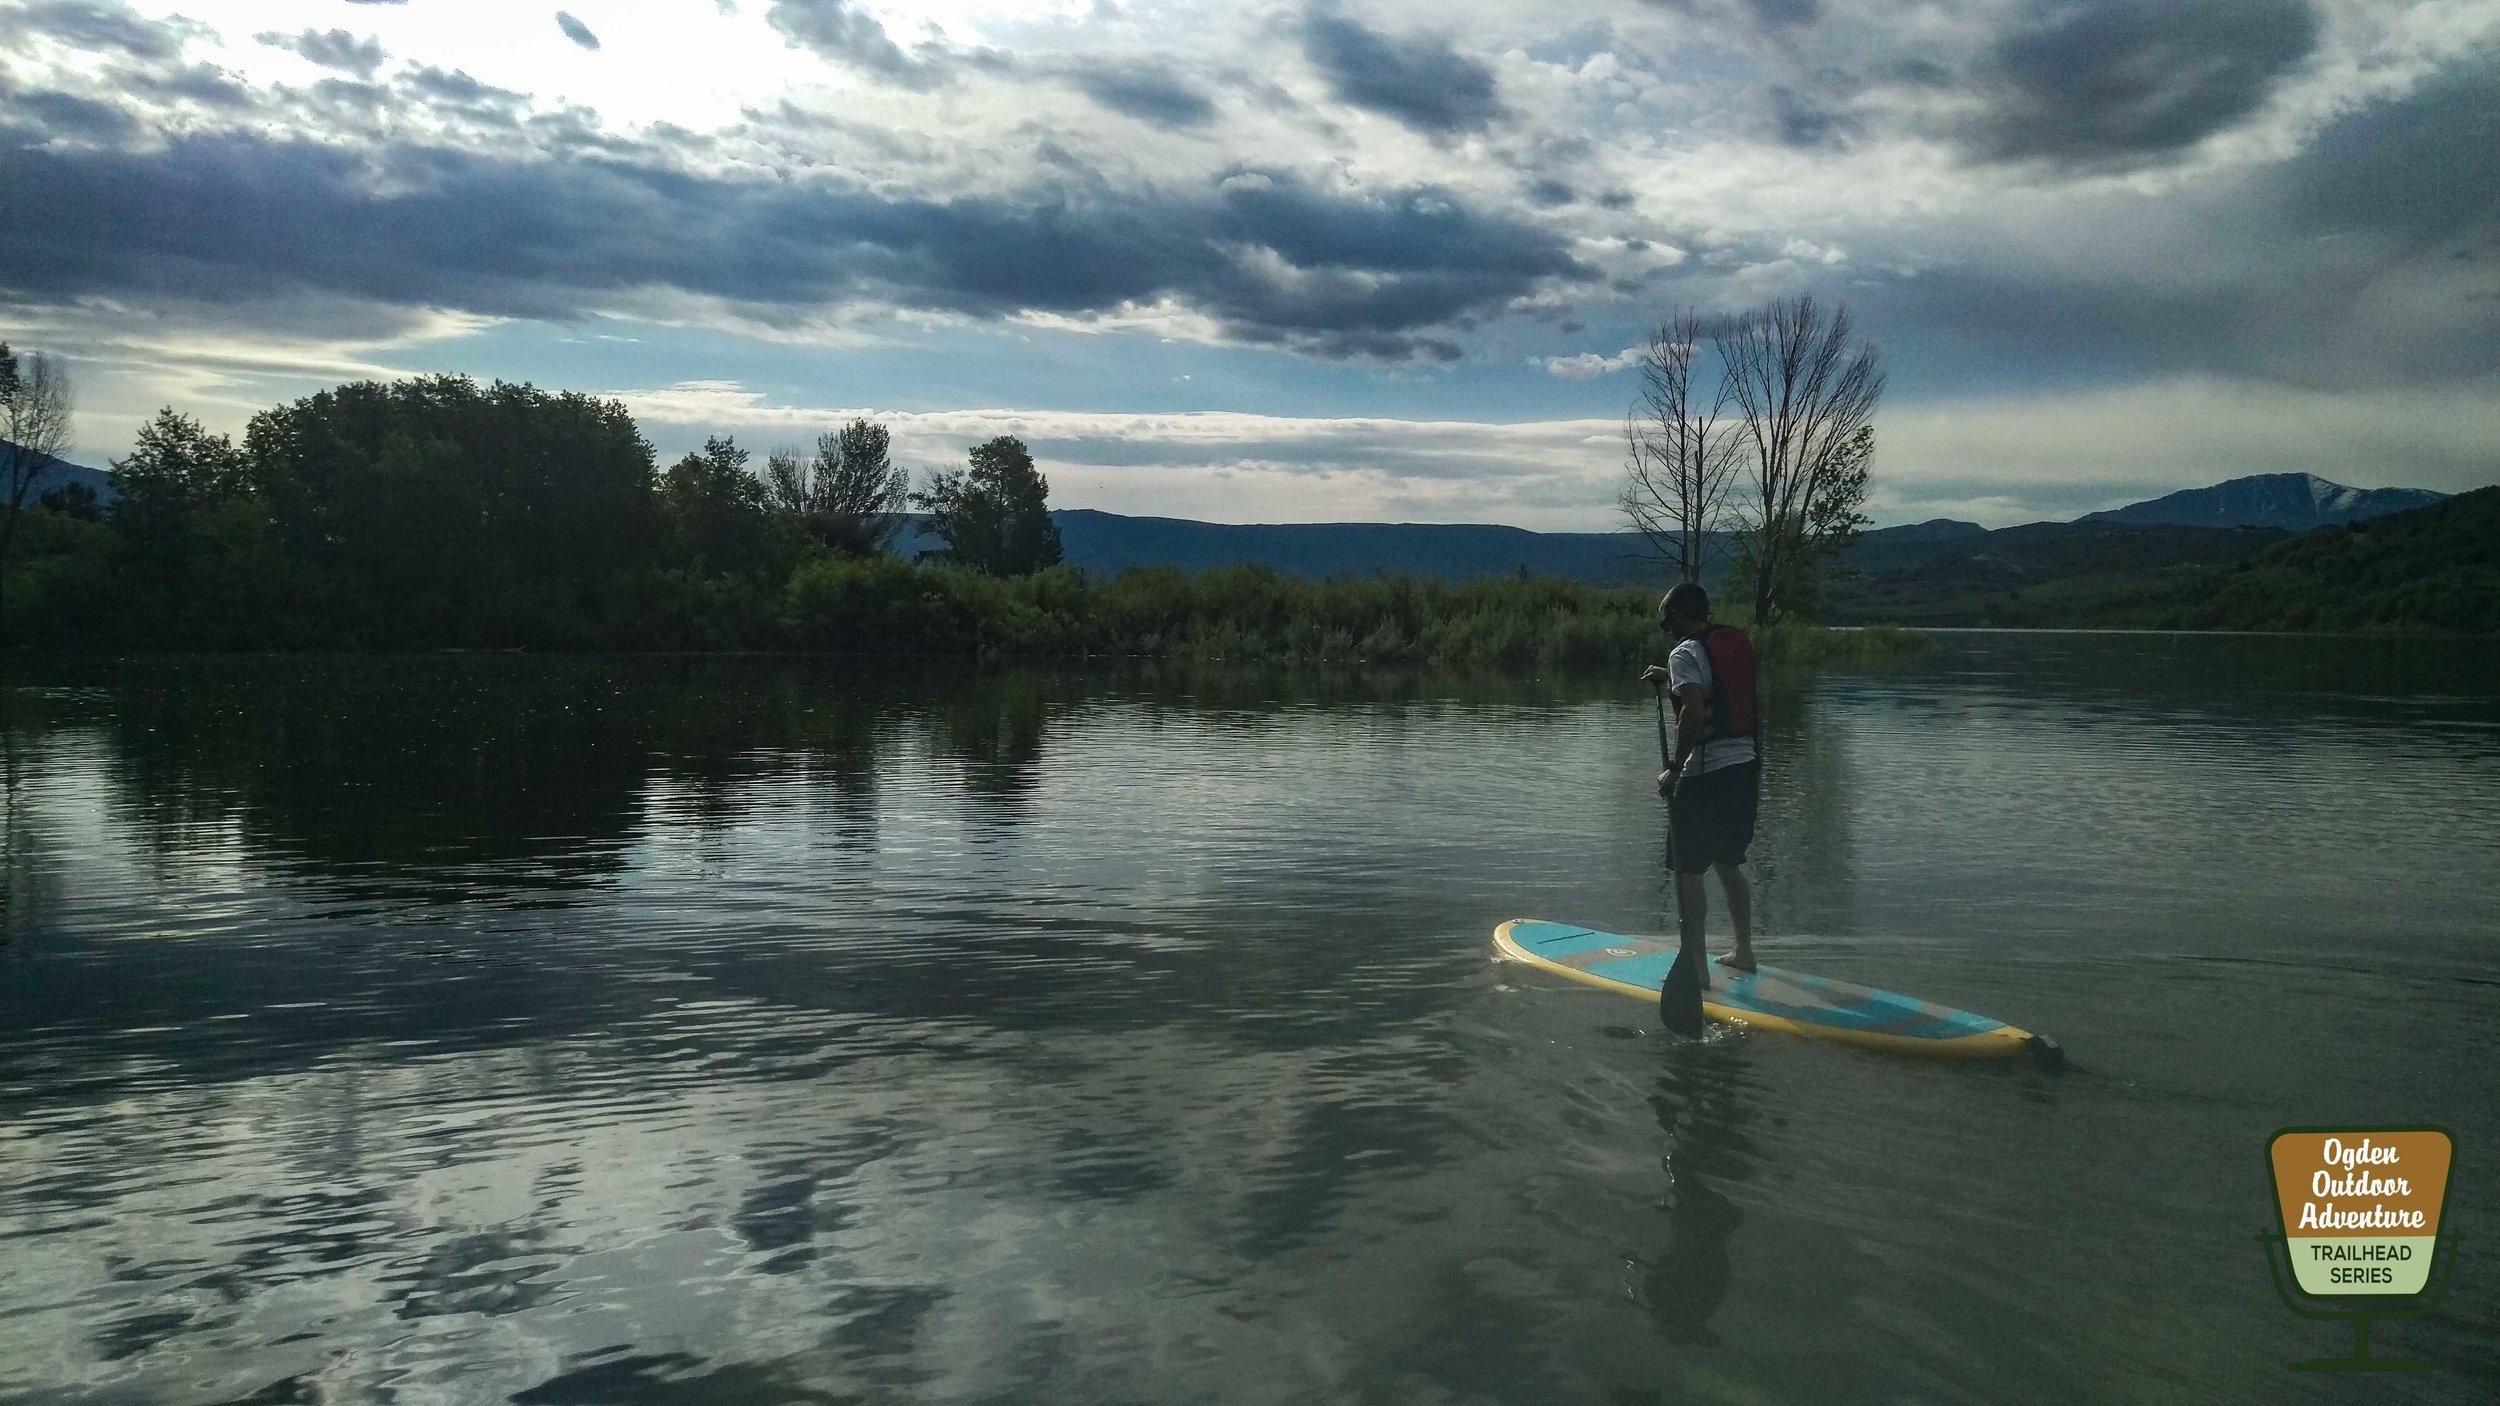 Ogden Outdoor Adventure Show 274 Muddy Rivers Telemark-1.jpg